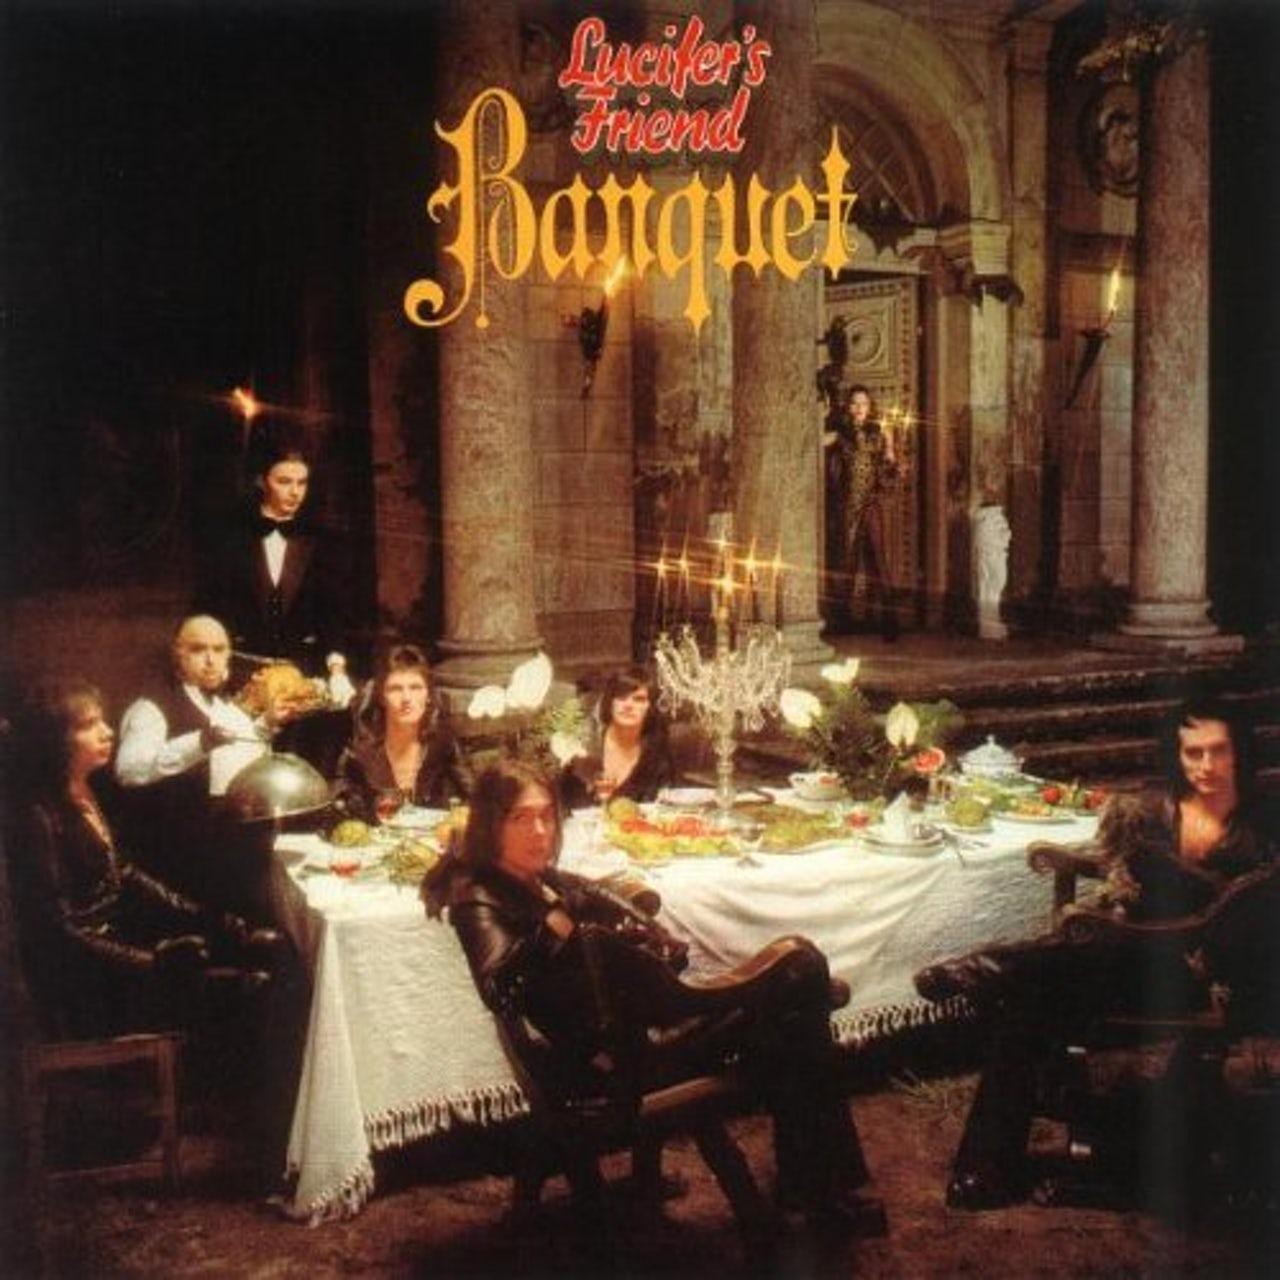 banquet_22.jpg